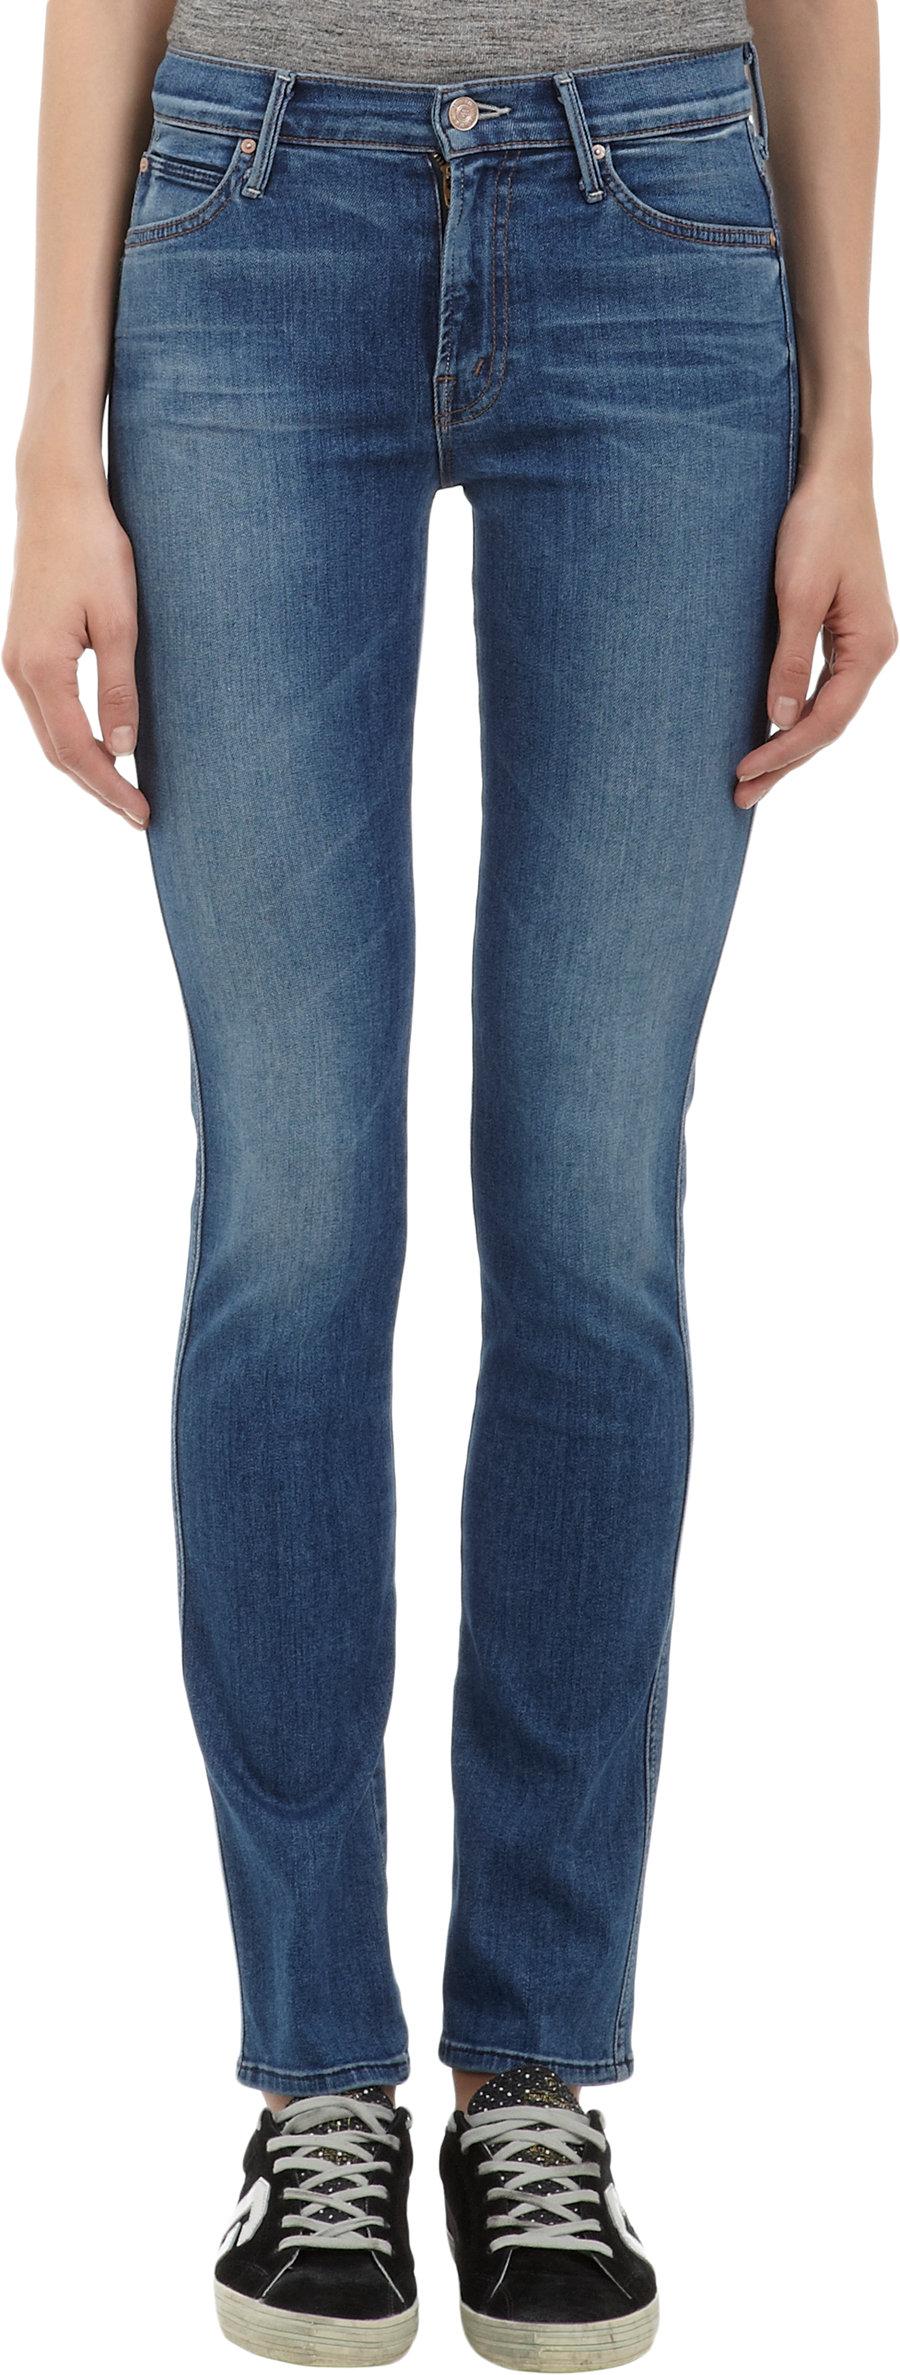 8896994d1713 Mother Highwaisted Rascal Skinny Jeans Famous Heroine in Blue - Lyst